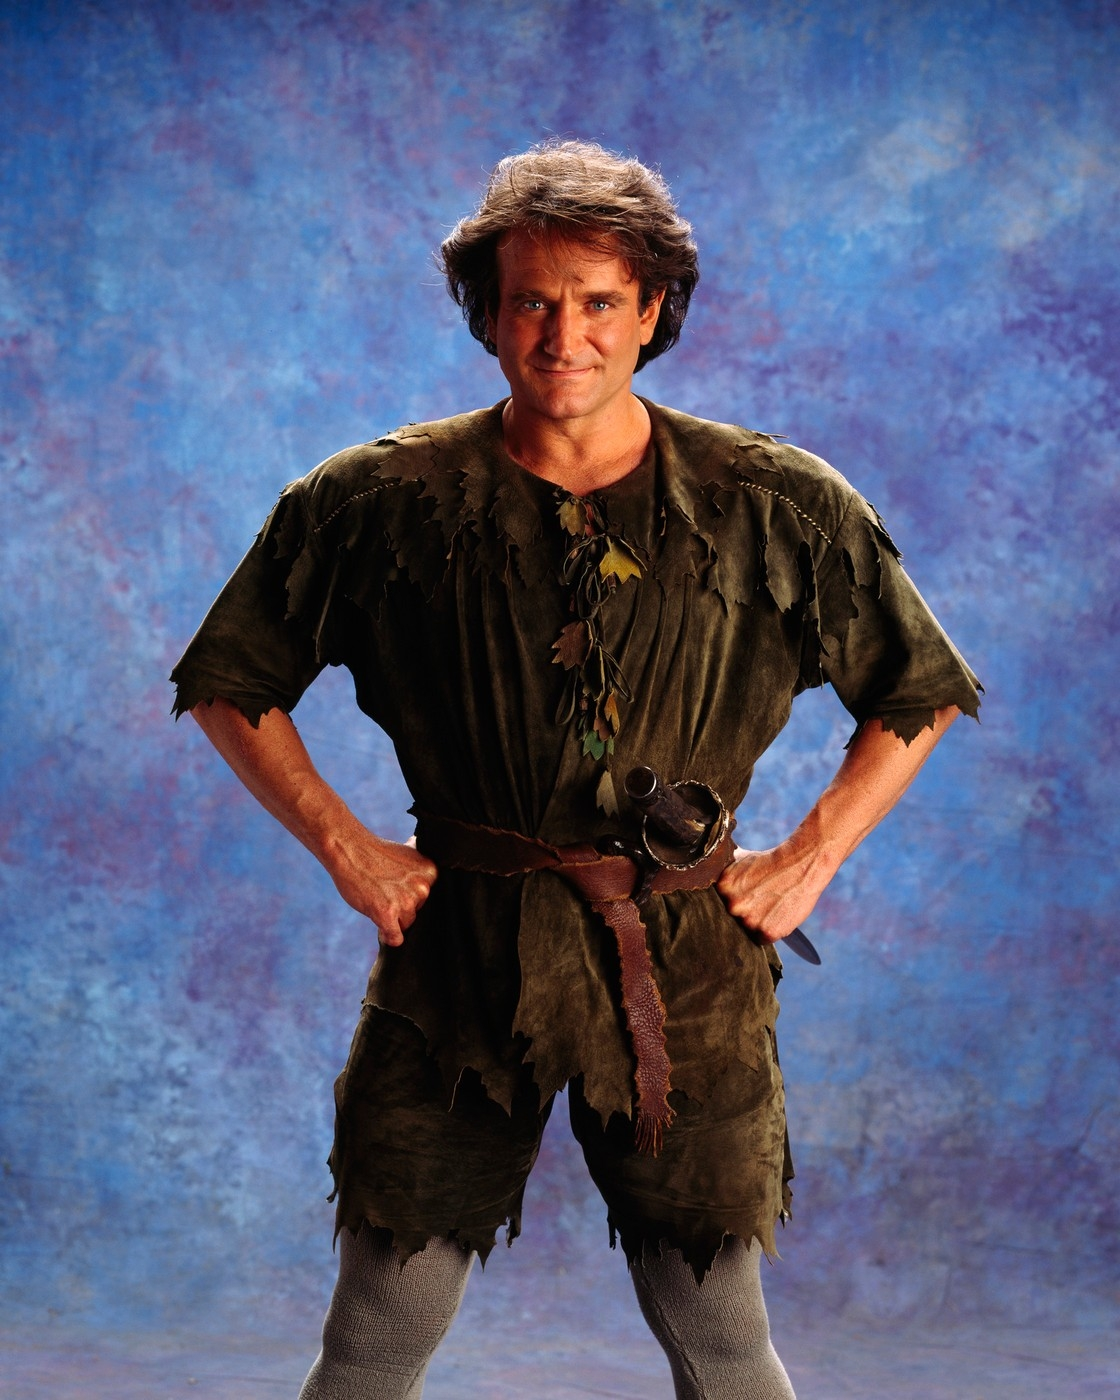 Peter Pan Robin Williams